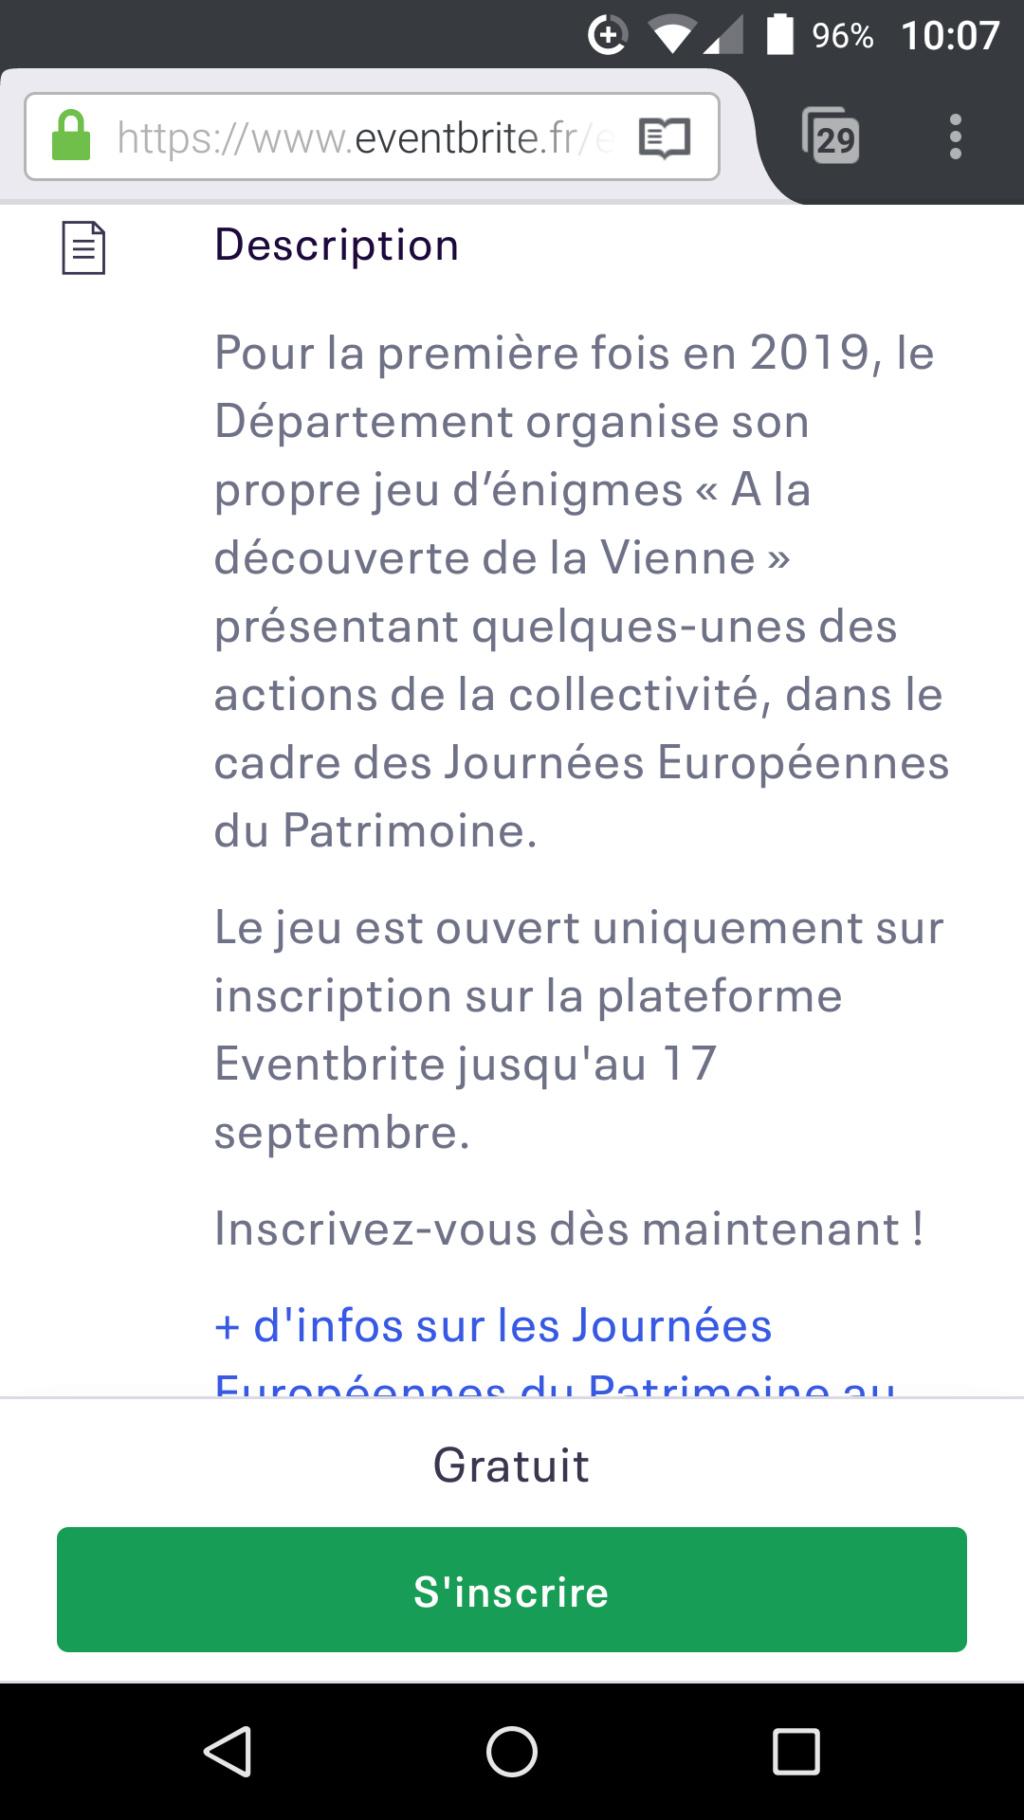 Rencontre sur Poitiers ? - Page 9 Screen12